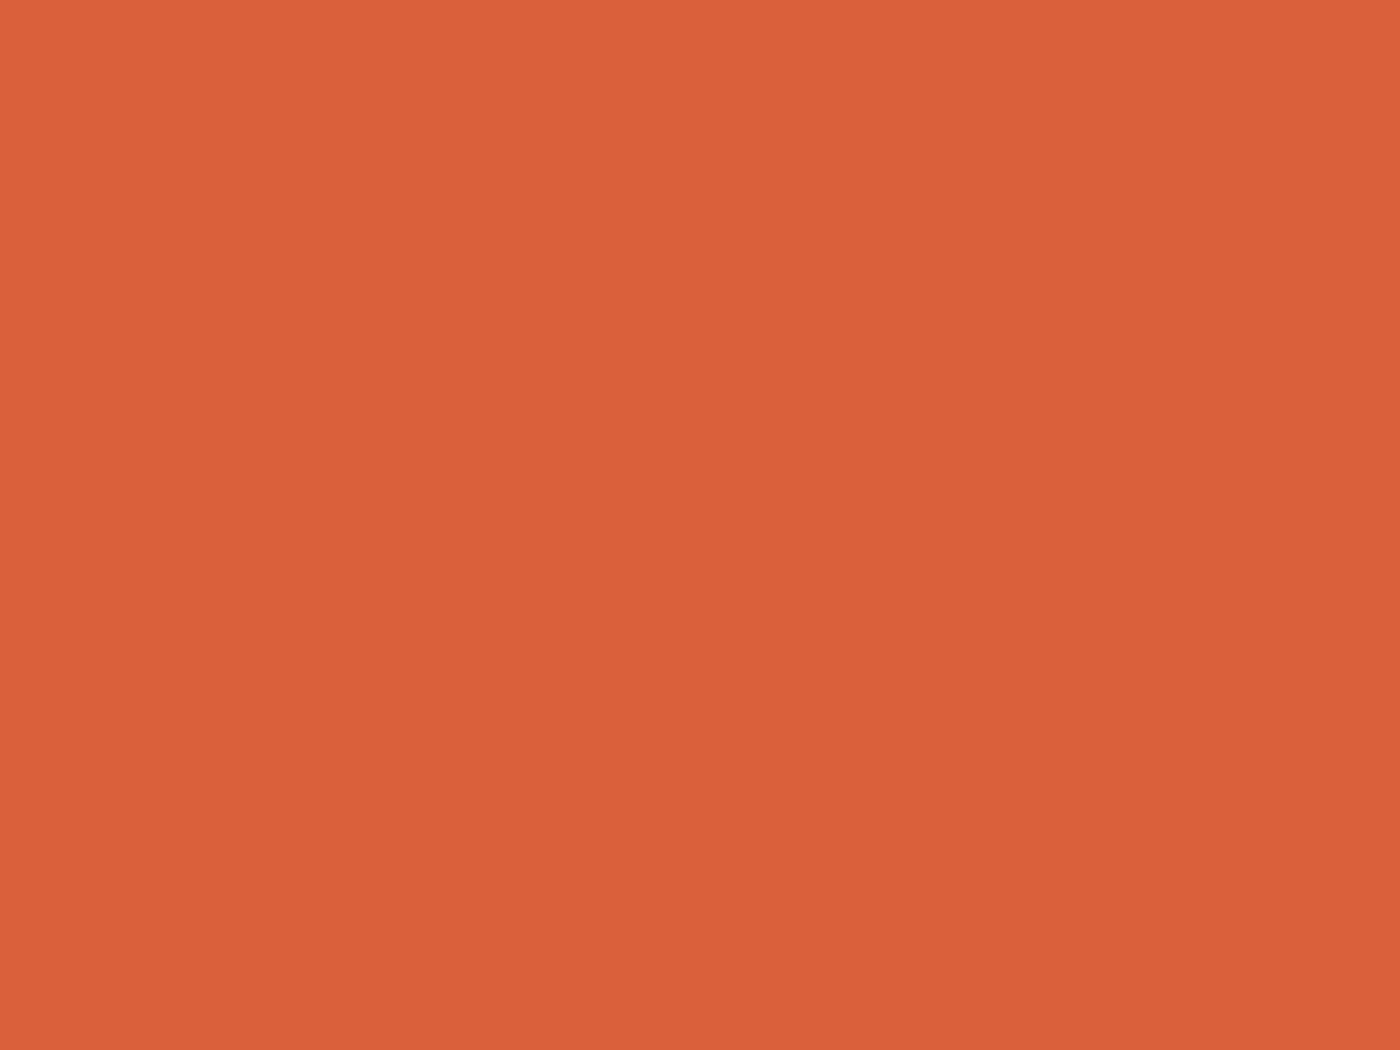 1400x1050 Medium Vermilion Solid Color Background